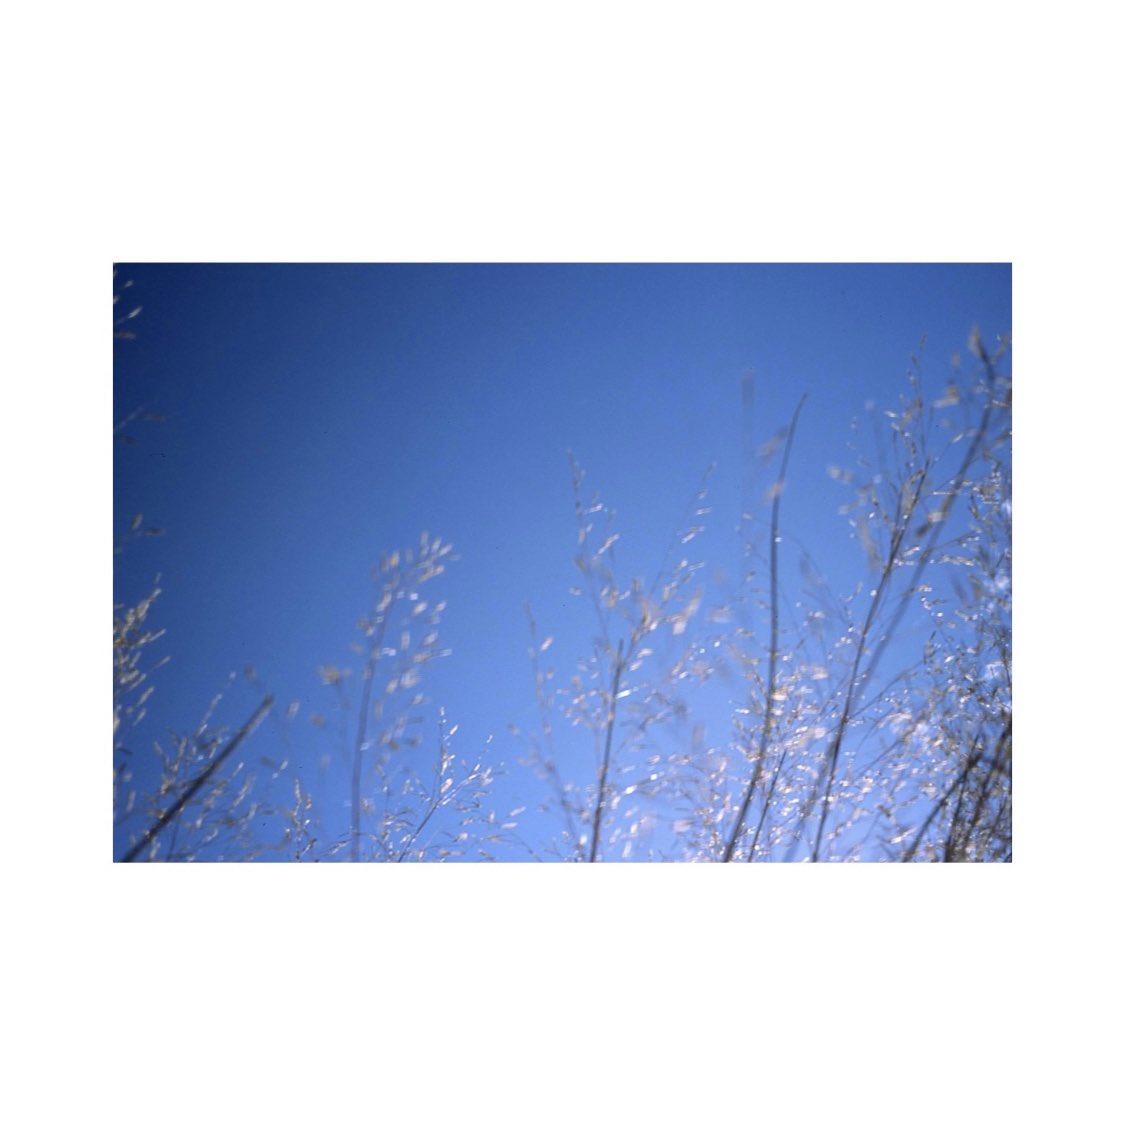 #olympustrip35 #olympus #agfa #agfact100 #film #filmcamera #filmphotography #instagram #instagramjapan #tokyocameraclub #sky #skylovers #skyblue #bluesky #whiteclouds #solar #wind #light #shadows #myworld